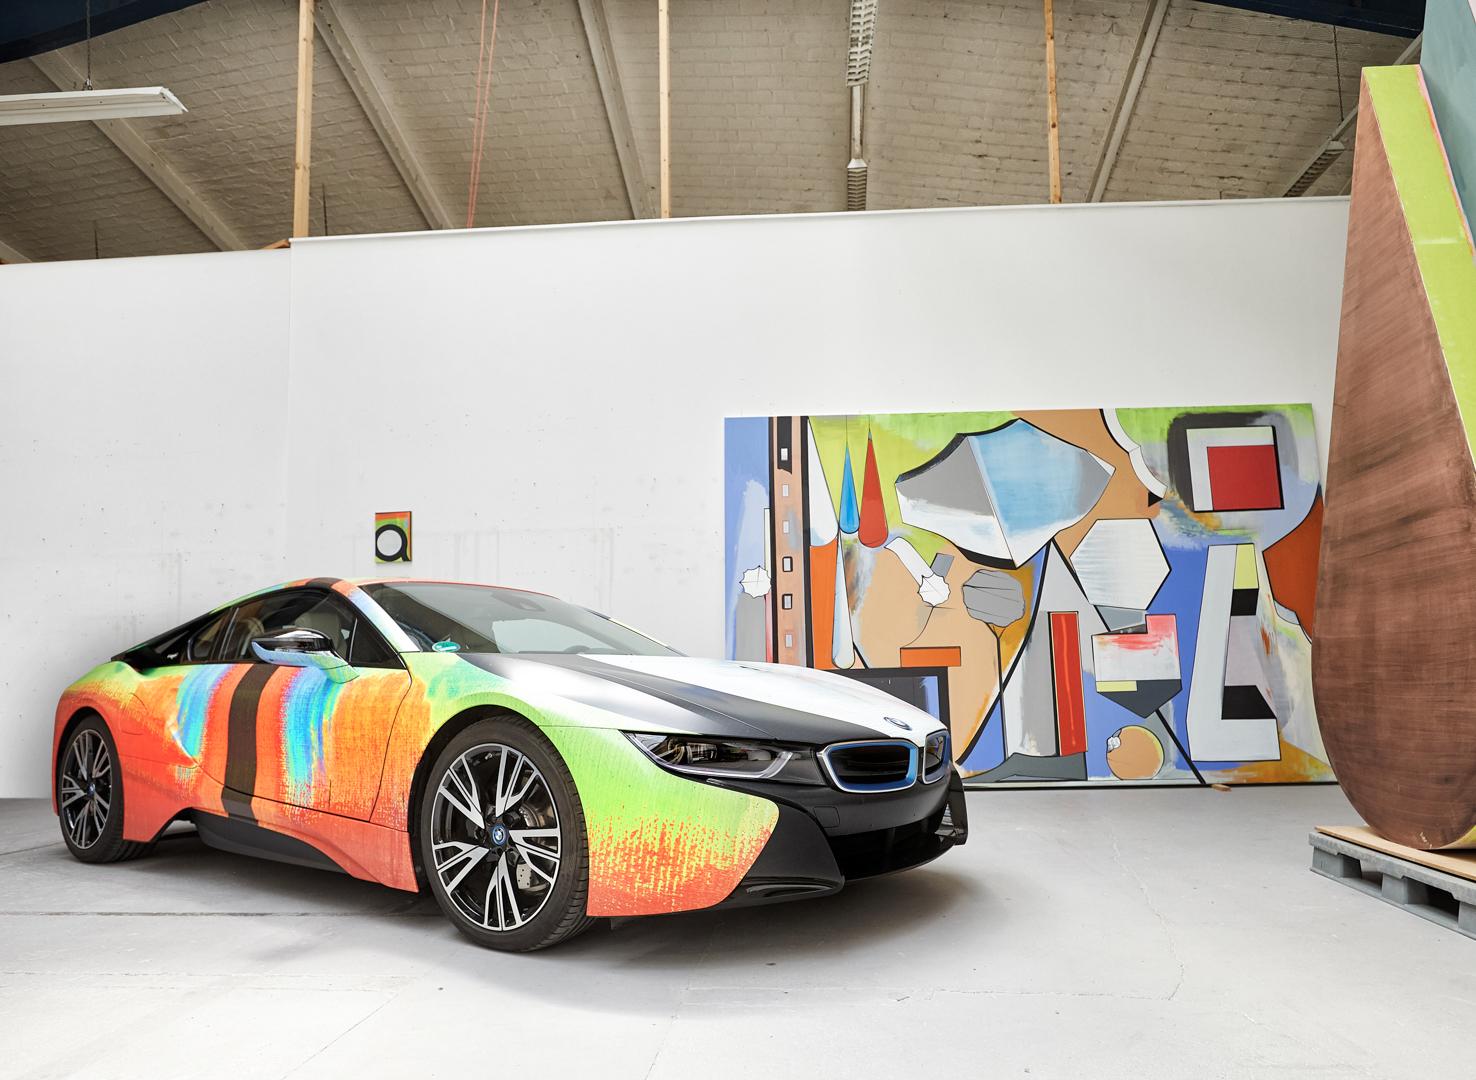 BMW i8 Art Work 2 of 17